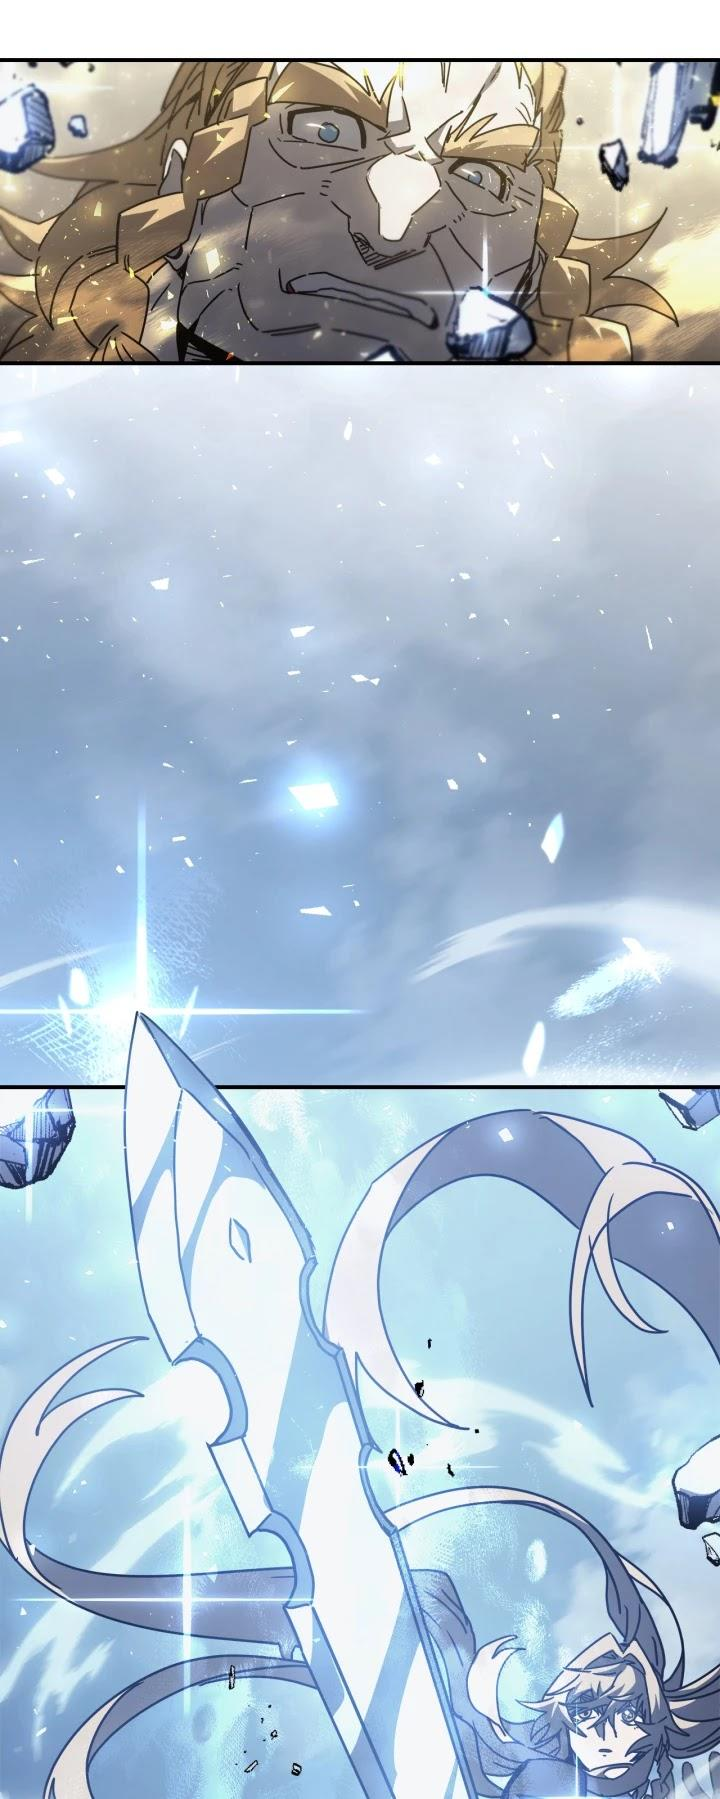 A Returner's Magic Should Be Special Chapter 160 page 16 - Mangakakalots.com